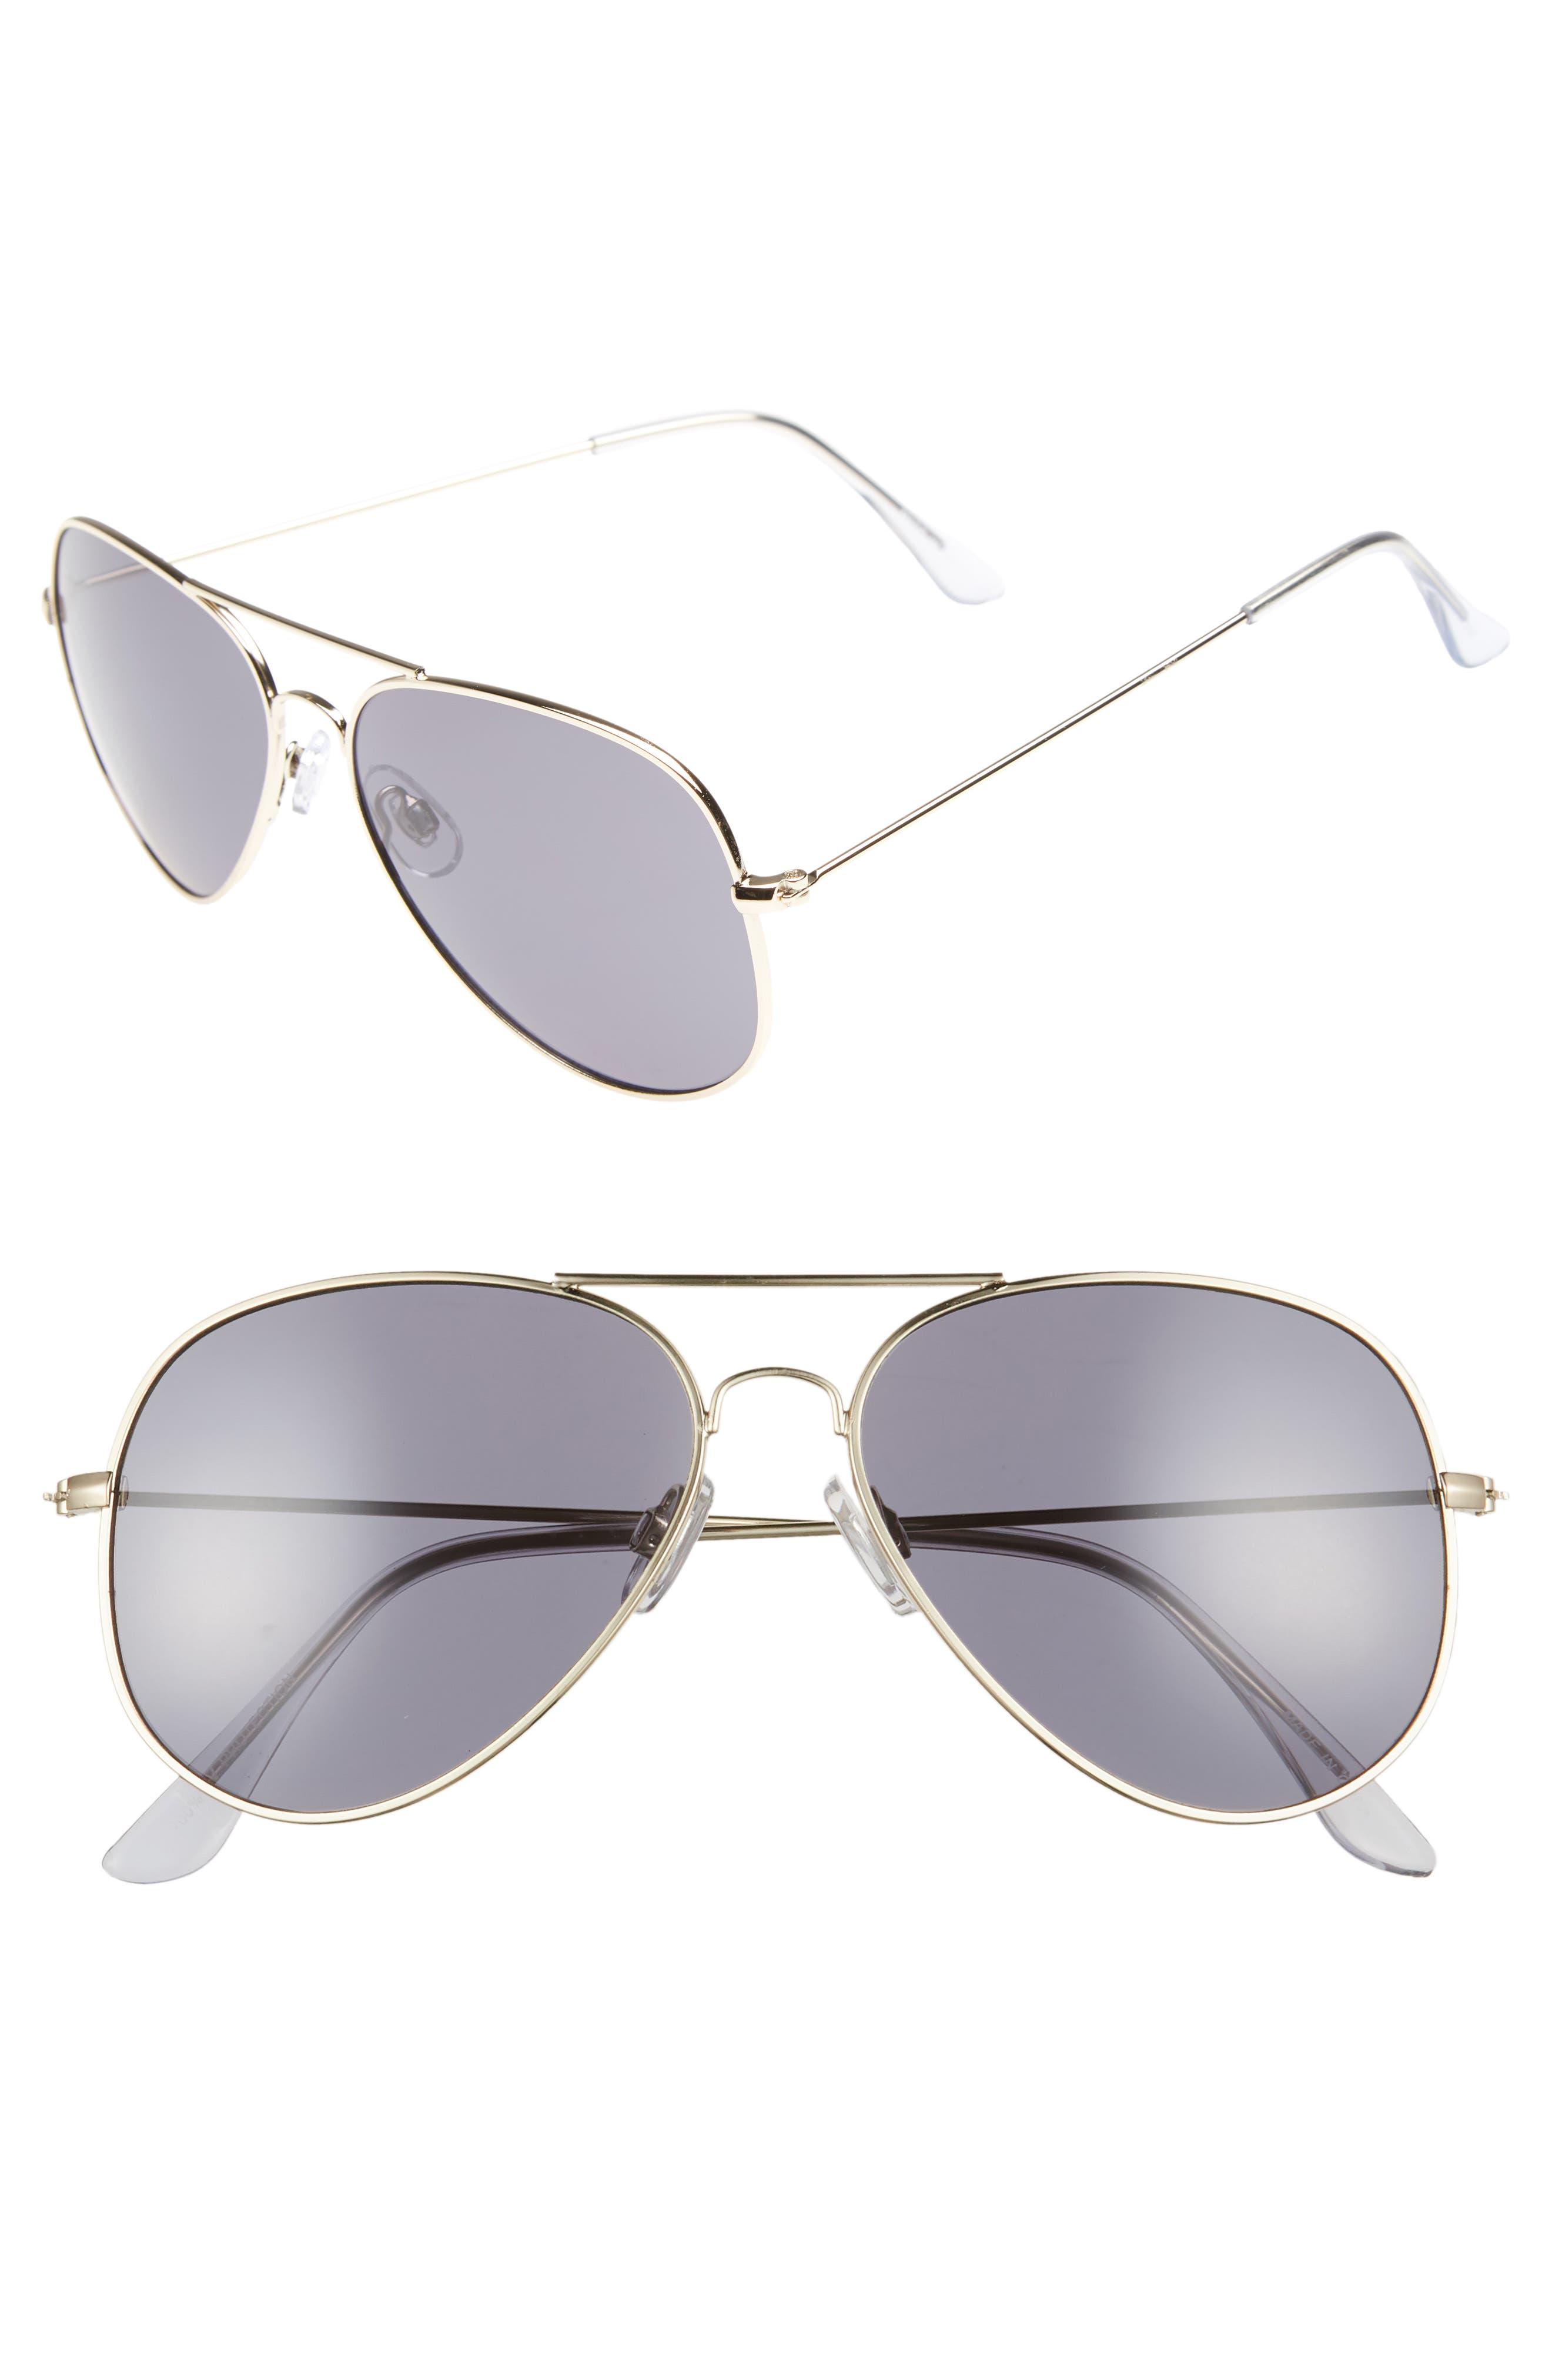 Mirrored Aviator 57mm Sunglasses,                         Main,                         color, Gold/ Smoke